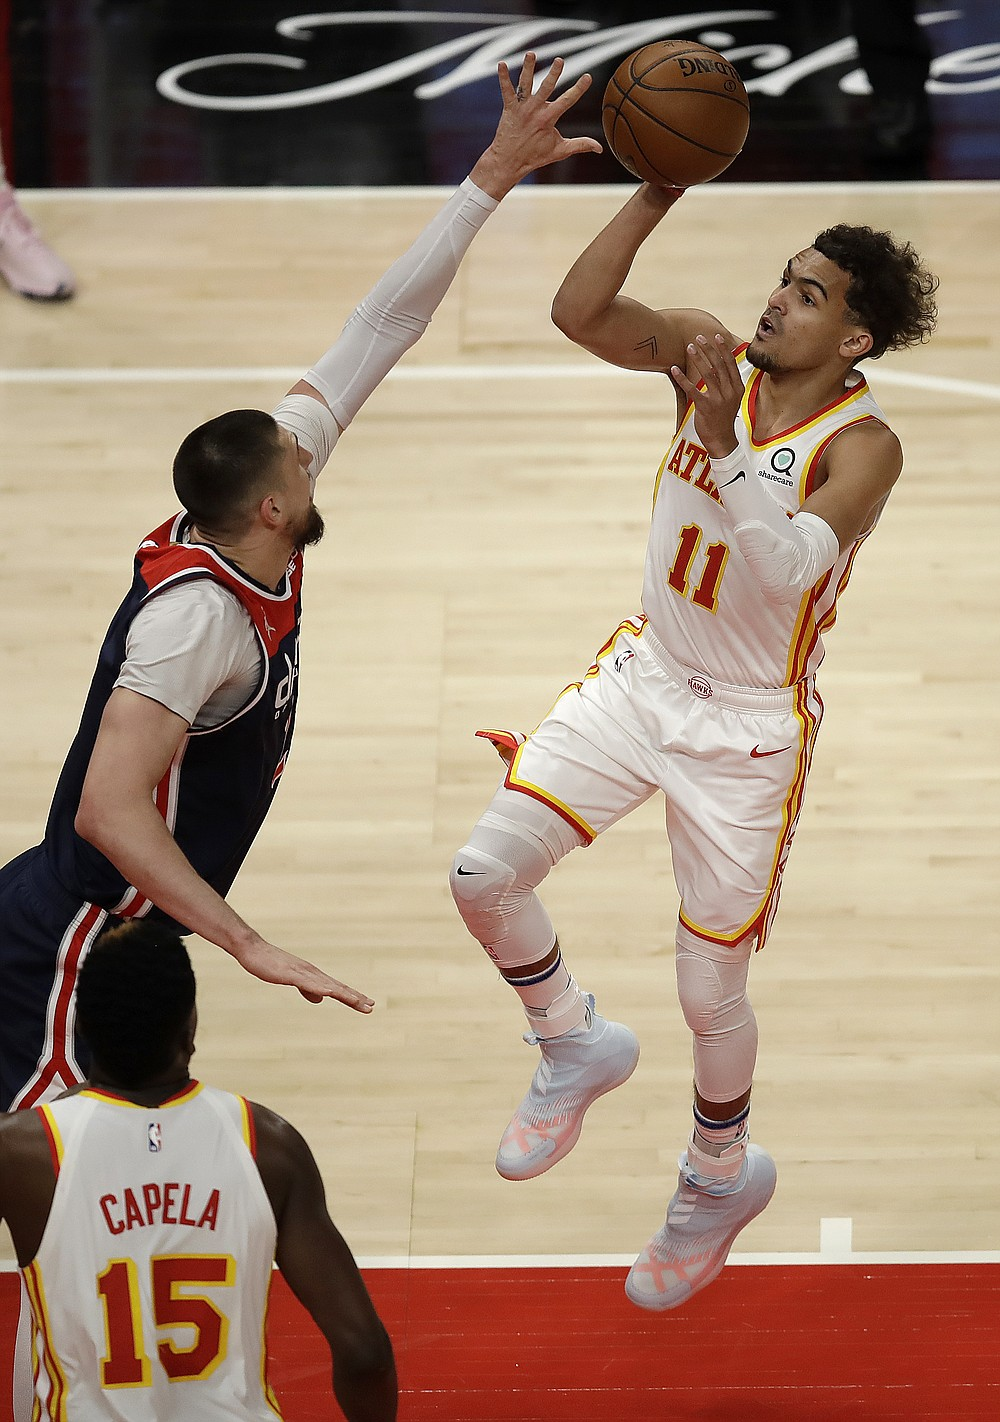 Atlanta Hawks' Trae Young, right, shoots over Washington Wizards' Alex Len during the first half of an NBA basketball game Monday, May 10, 2021, in Atlanta. (AP Photo/Ben Margot)